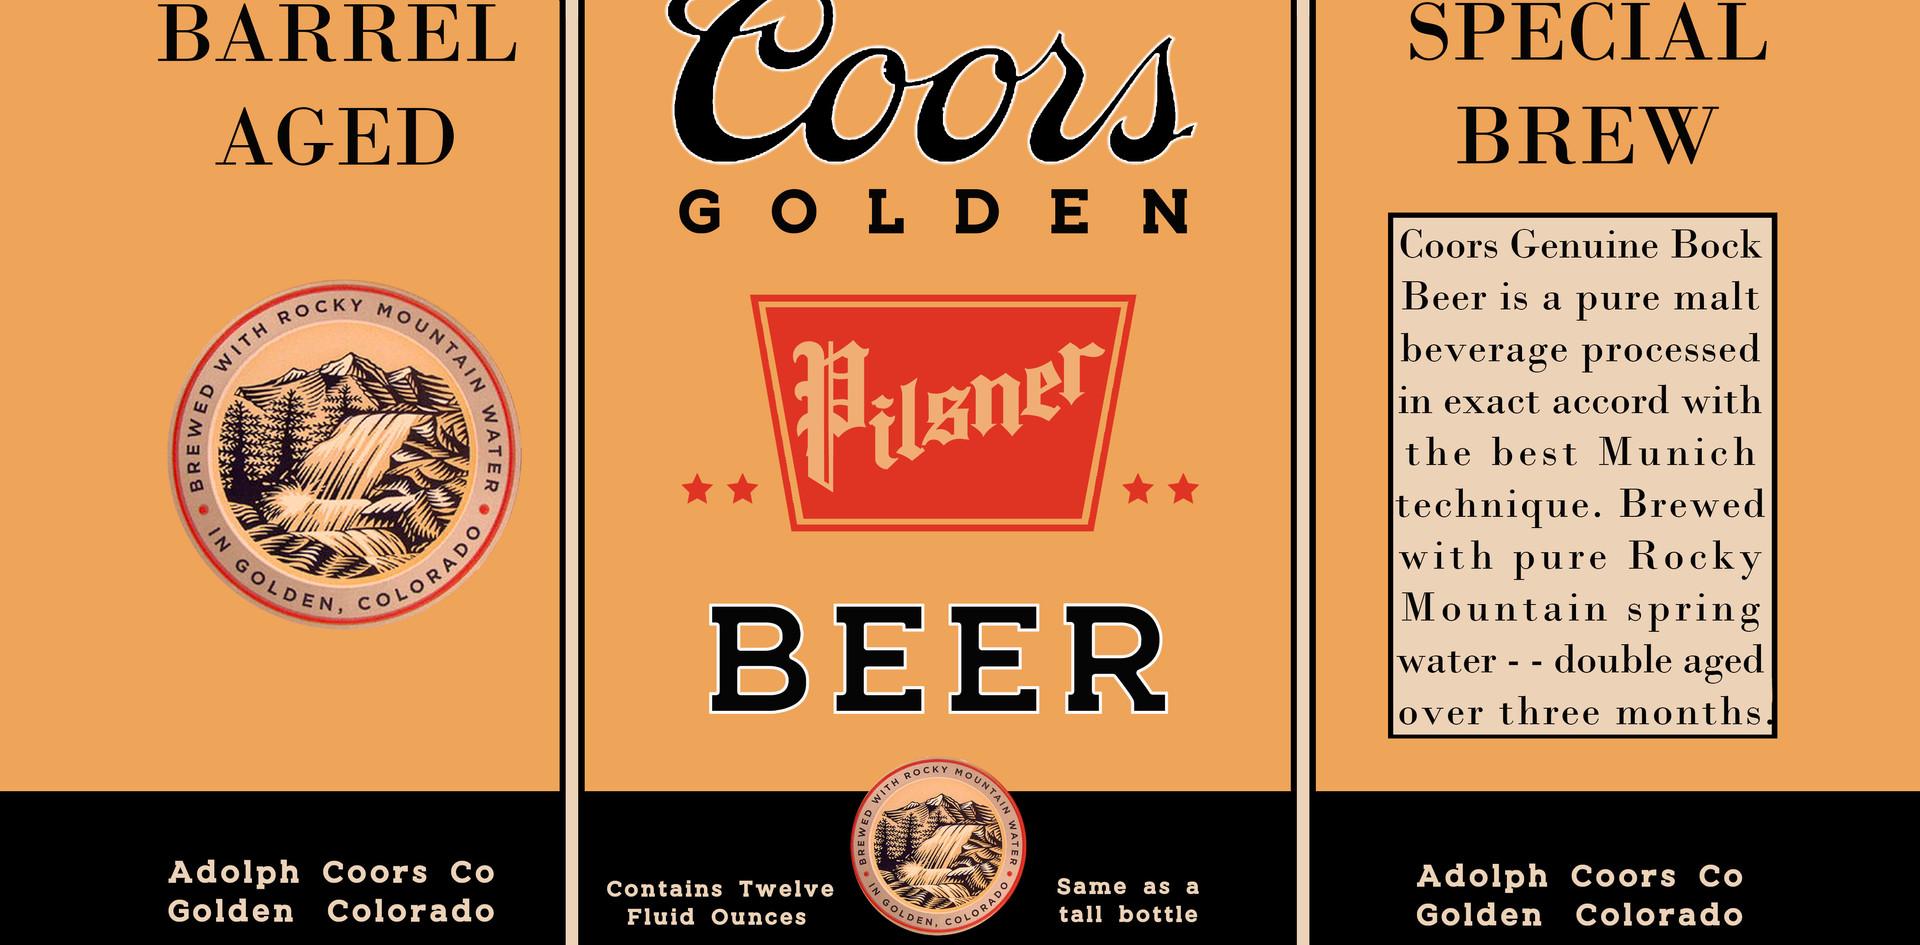 Coors beer bottle label #2